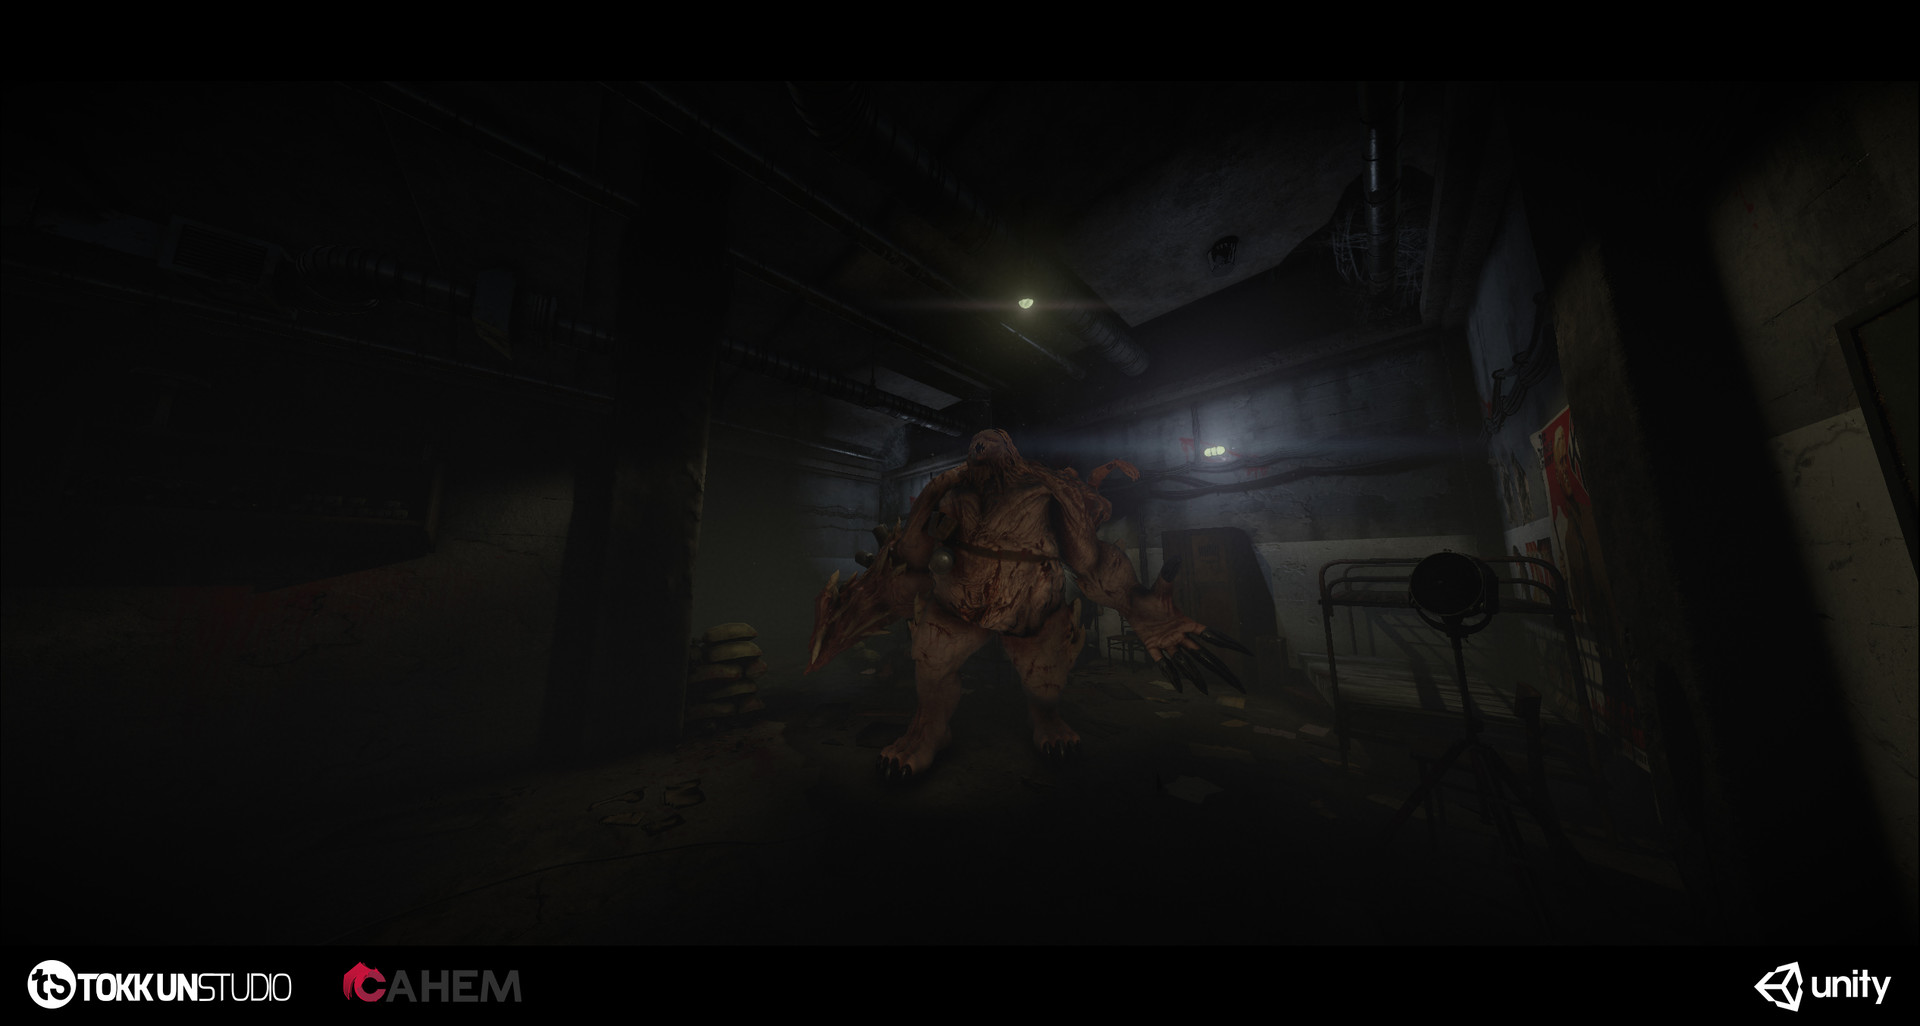 Tokkun studio bunker shot 34